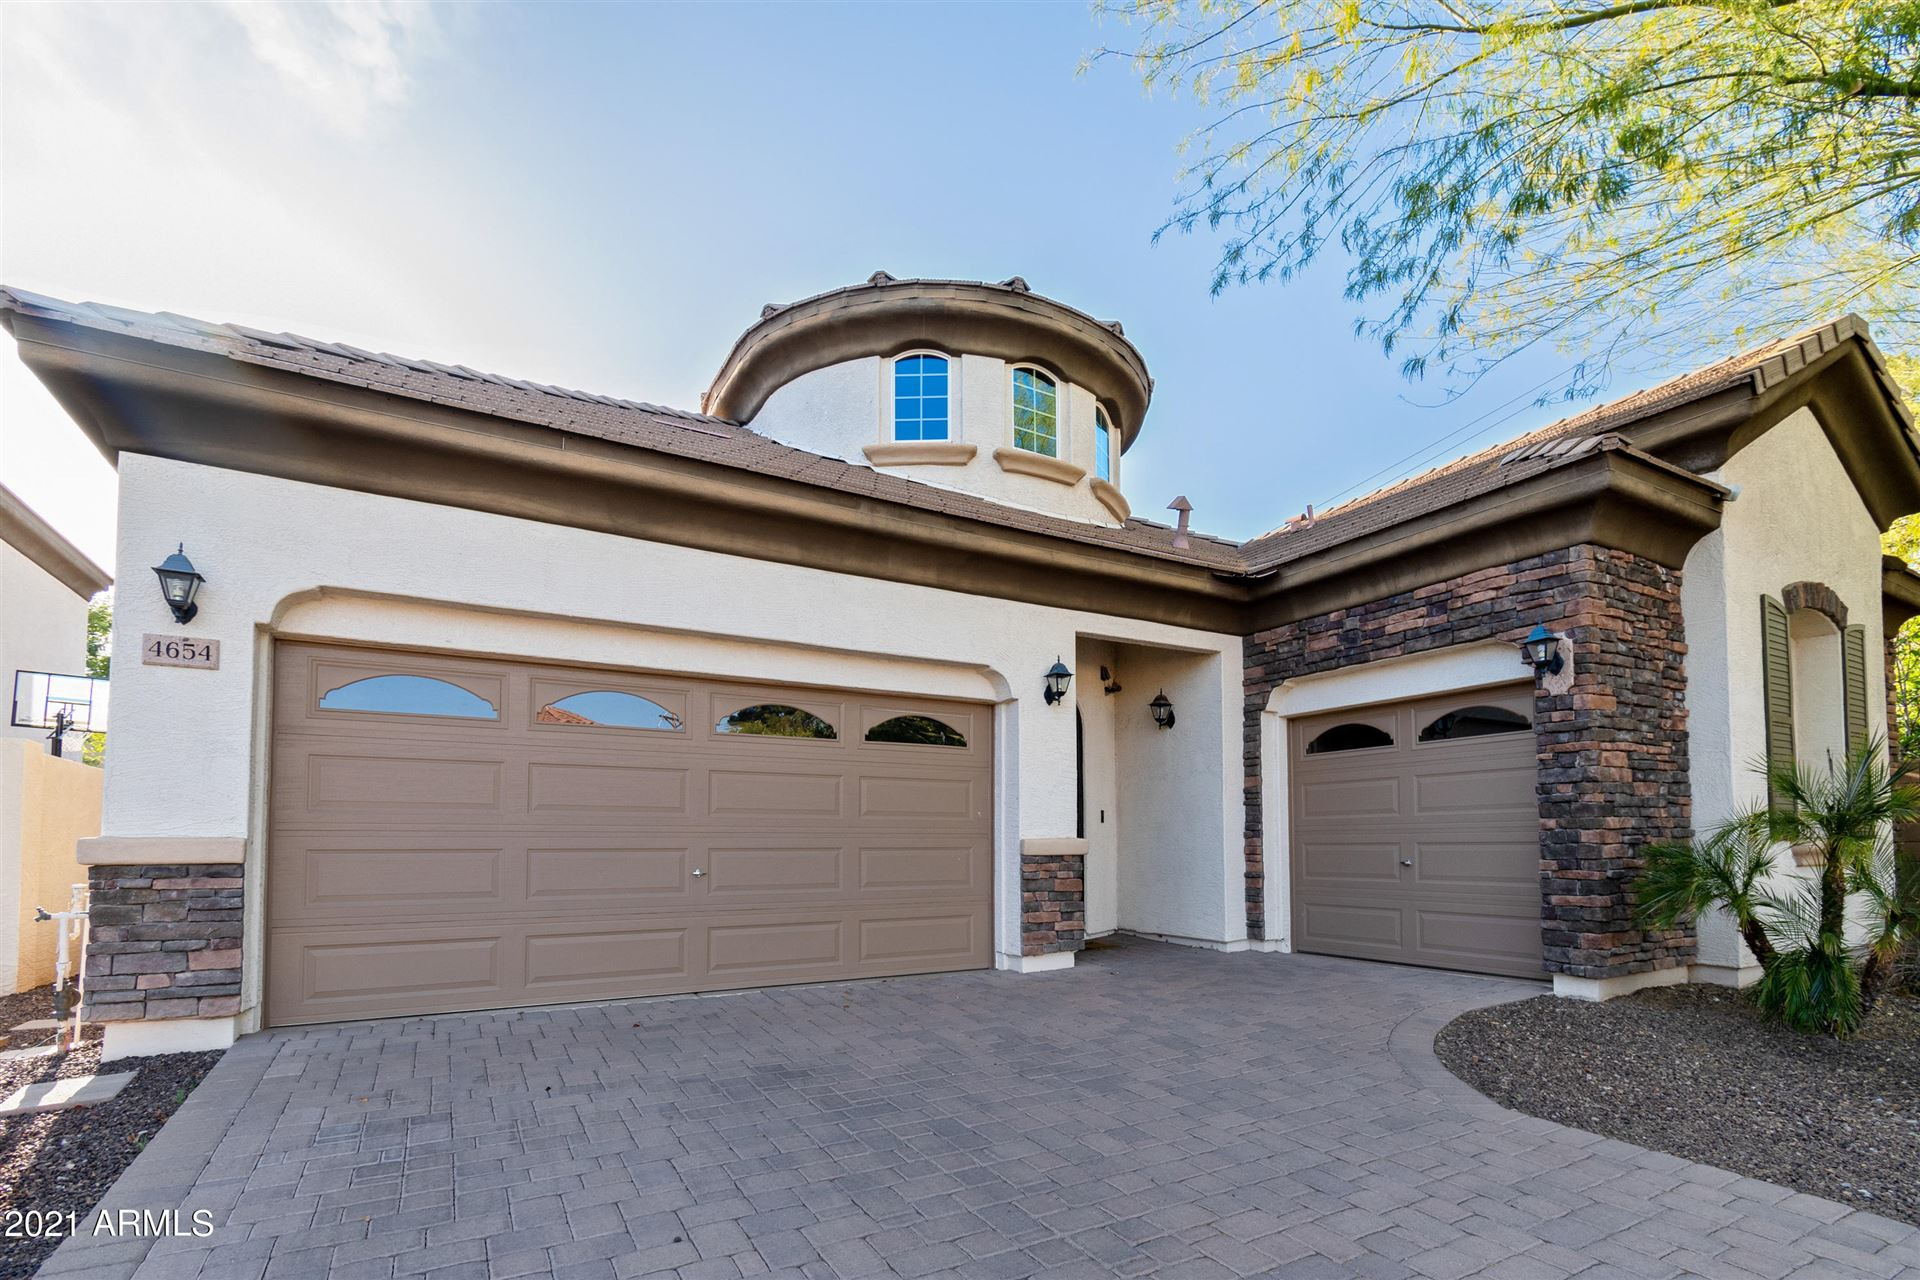 4654 N 29TH Place, Phoenix, AZ 85016 - MLS#: 6212175